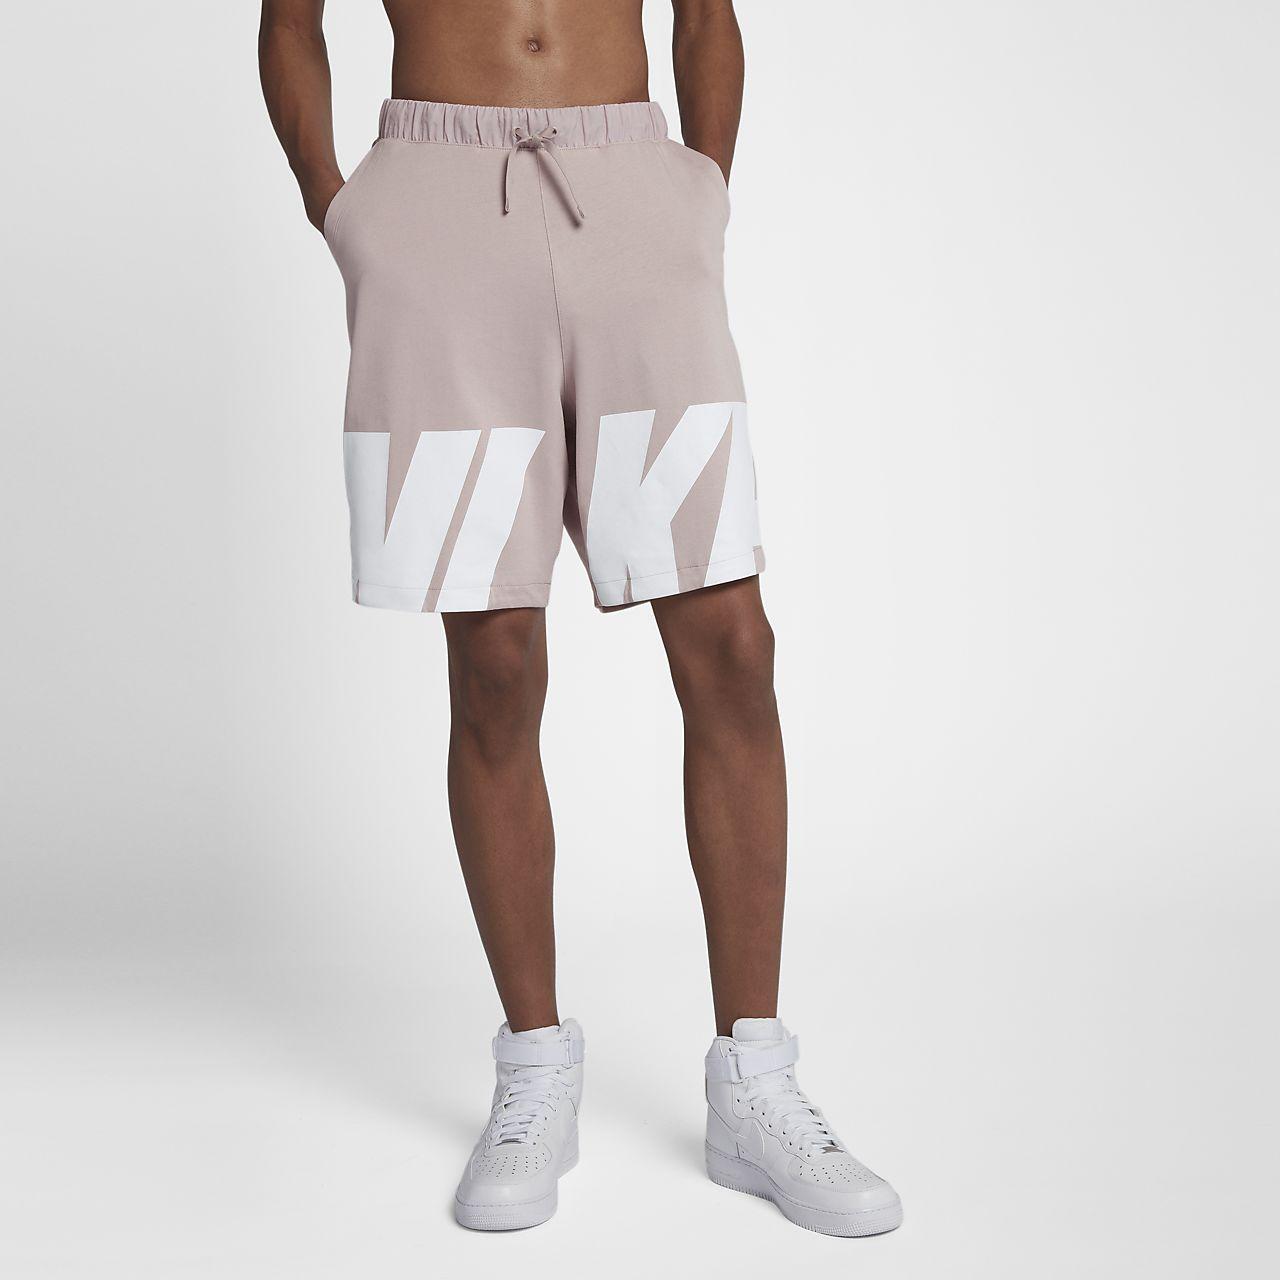 0fed32477d Ropa Nike para hombre Pantalones cortos Nike GPX Strike Print Longer Woven  Ropa de deporte Negro Blanco